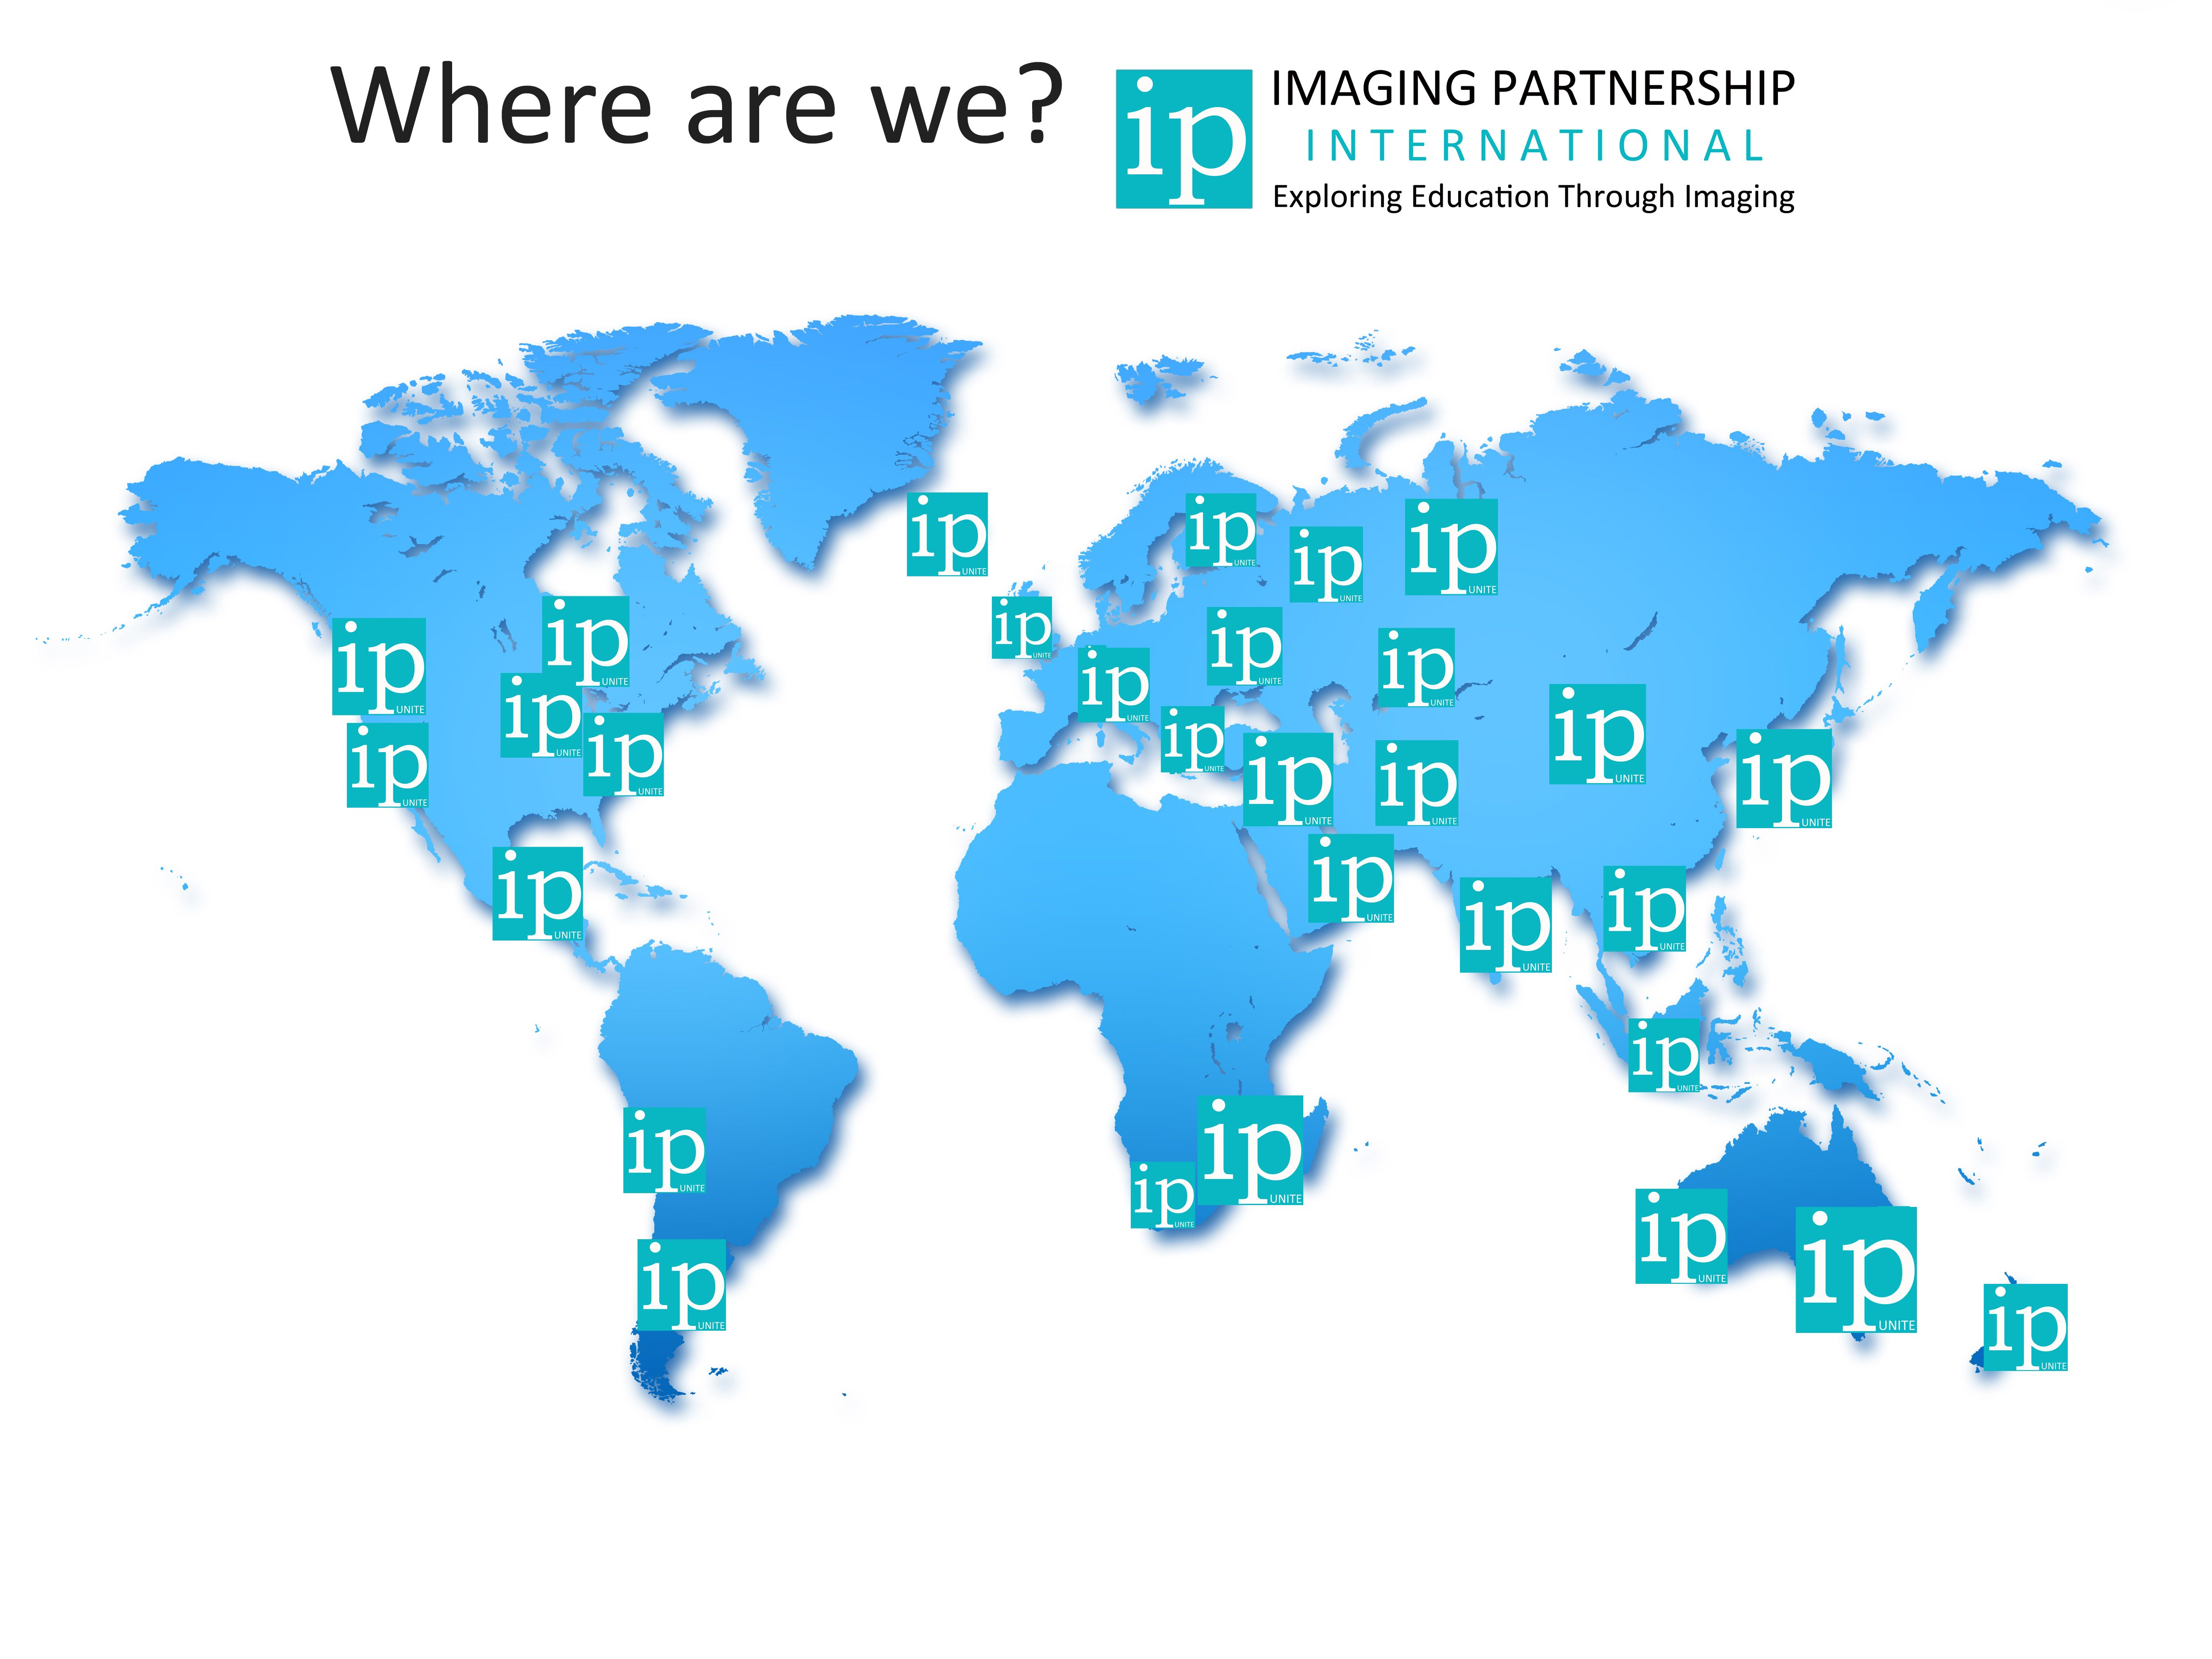 IP International - Where Are We